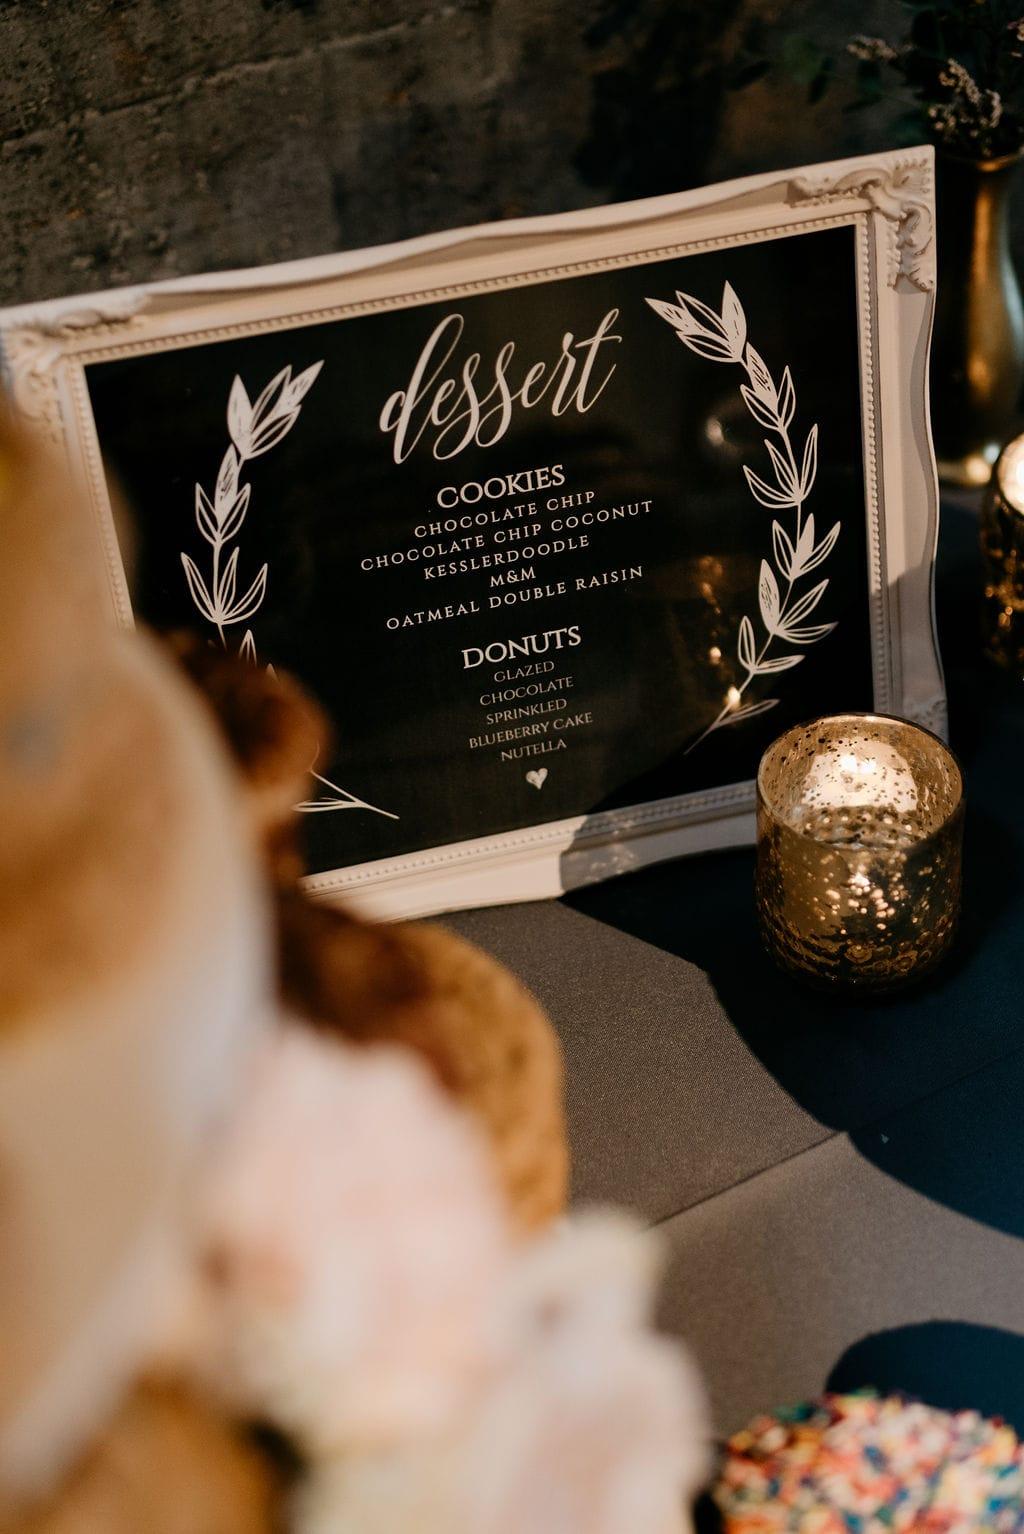 Dessert sign at wedding